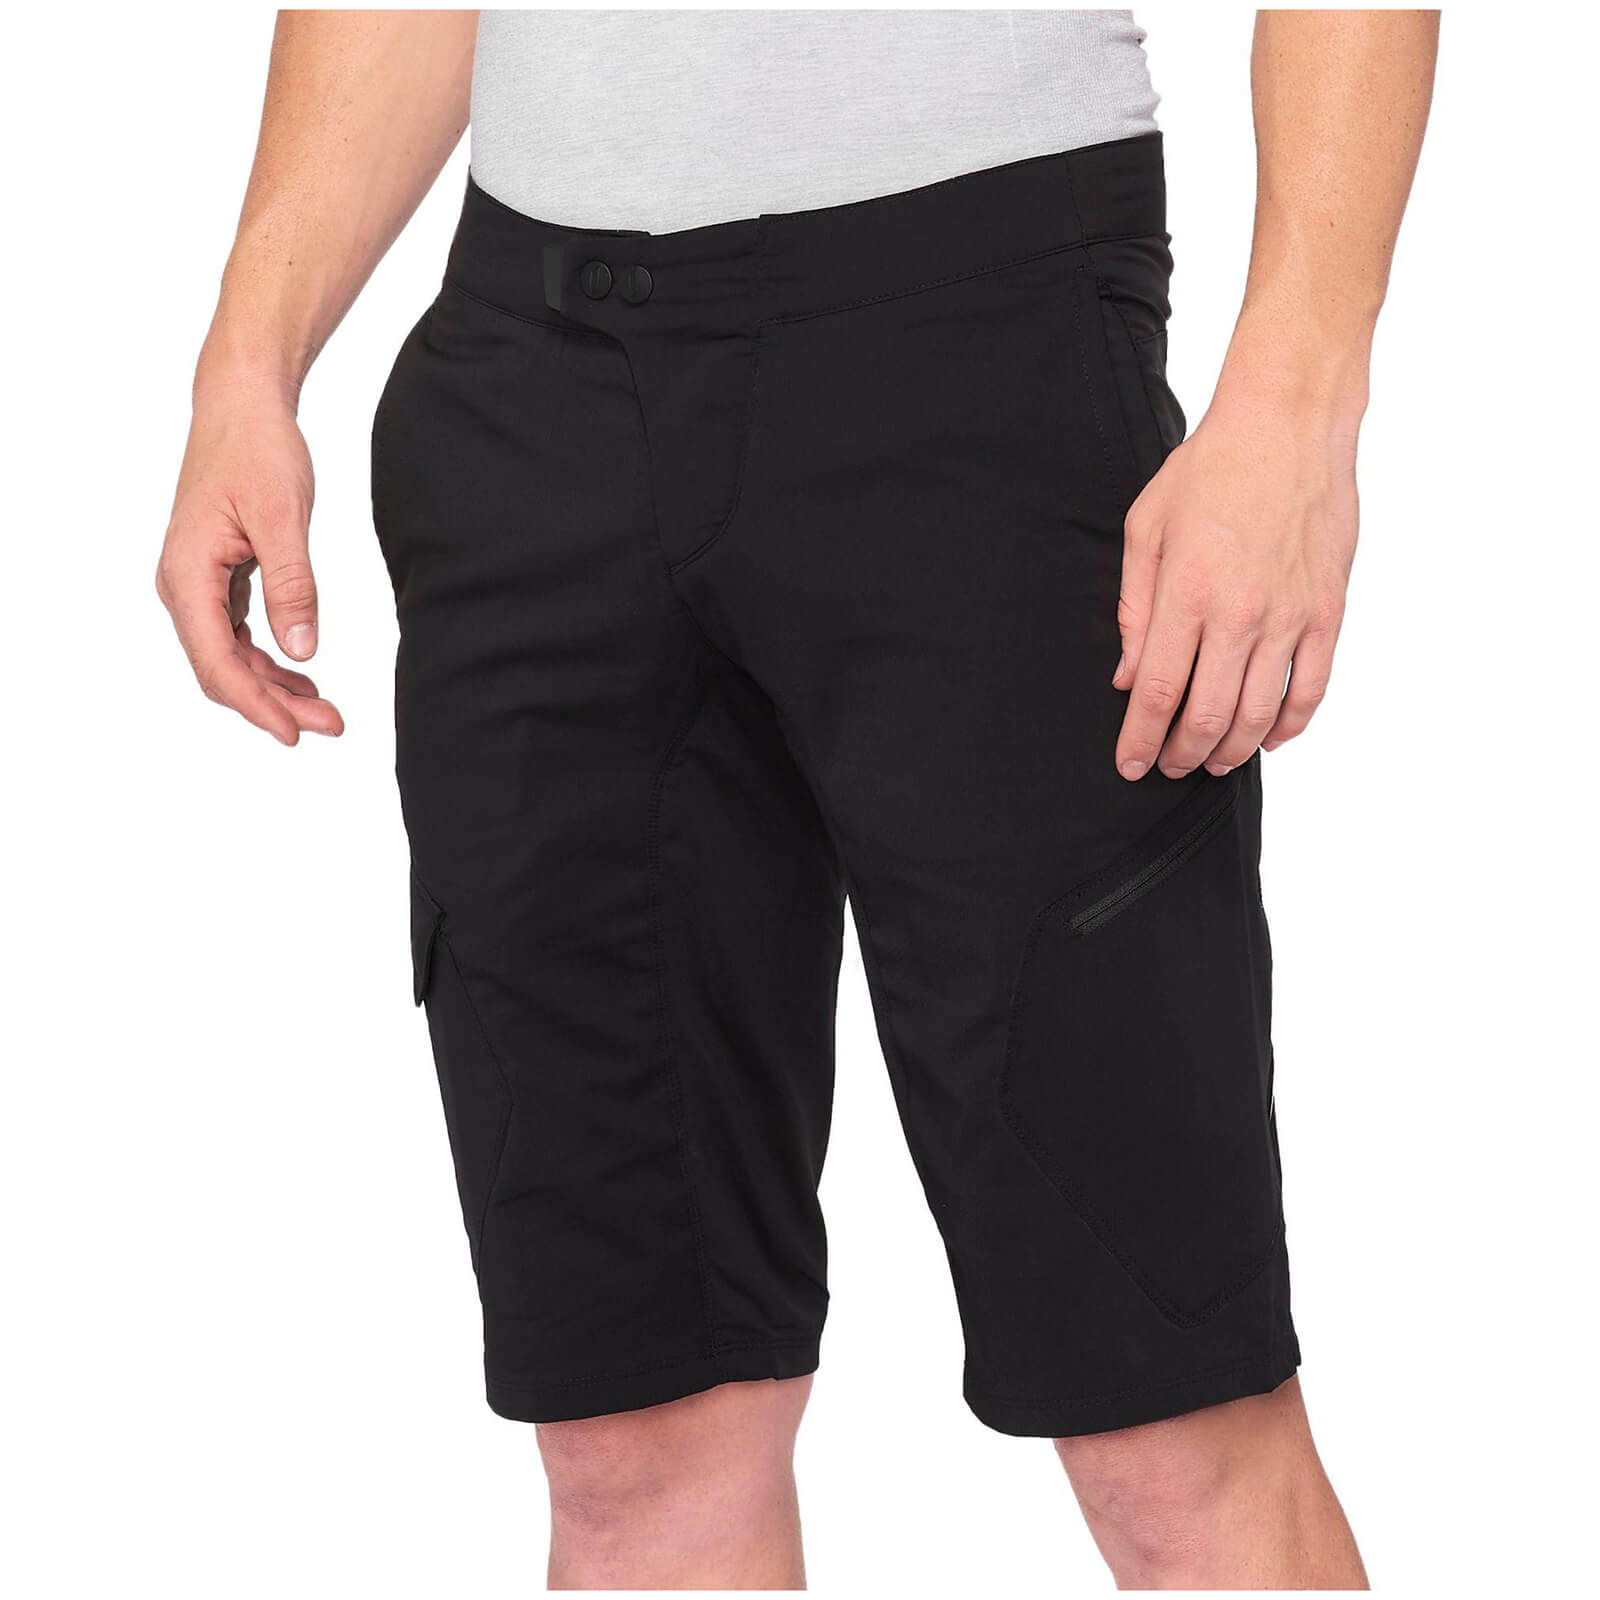 100% Ridecamp Mtb Shorts - 34 - Black